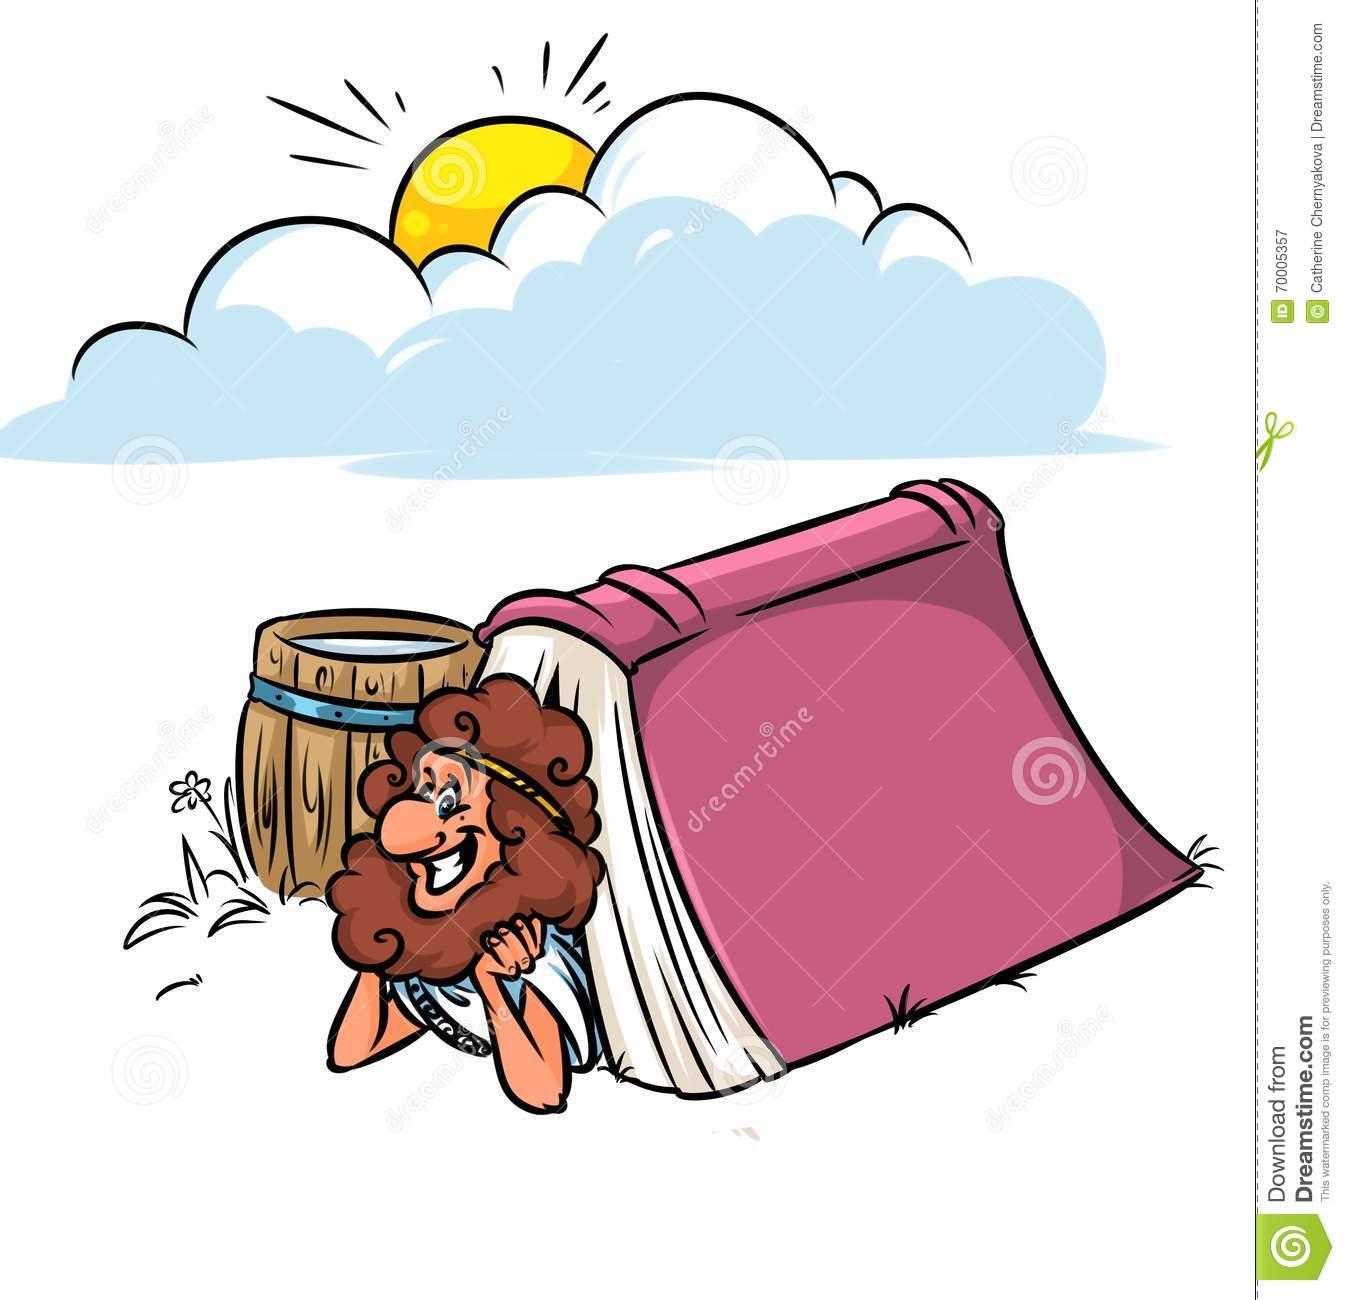 Greek Diogenes Book Philosophy Cartoon Stock Illustration.